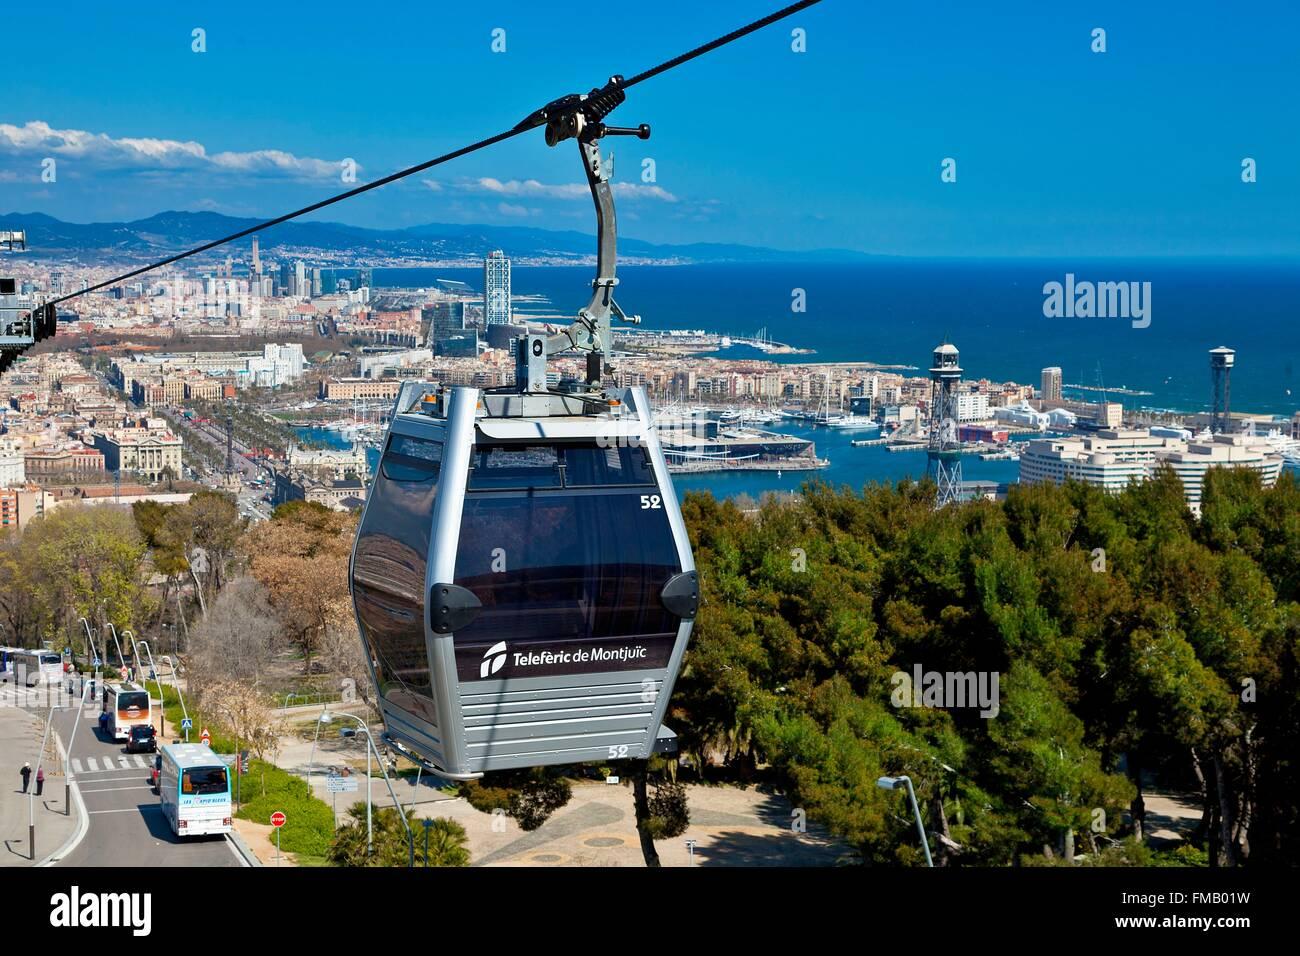 Spain, Catalonia, Barcelona, Montjuic Aerial Tram - Stock Image